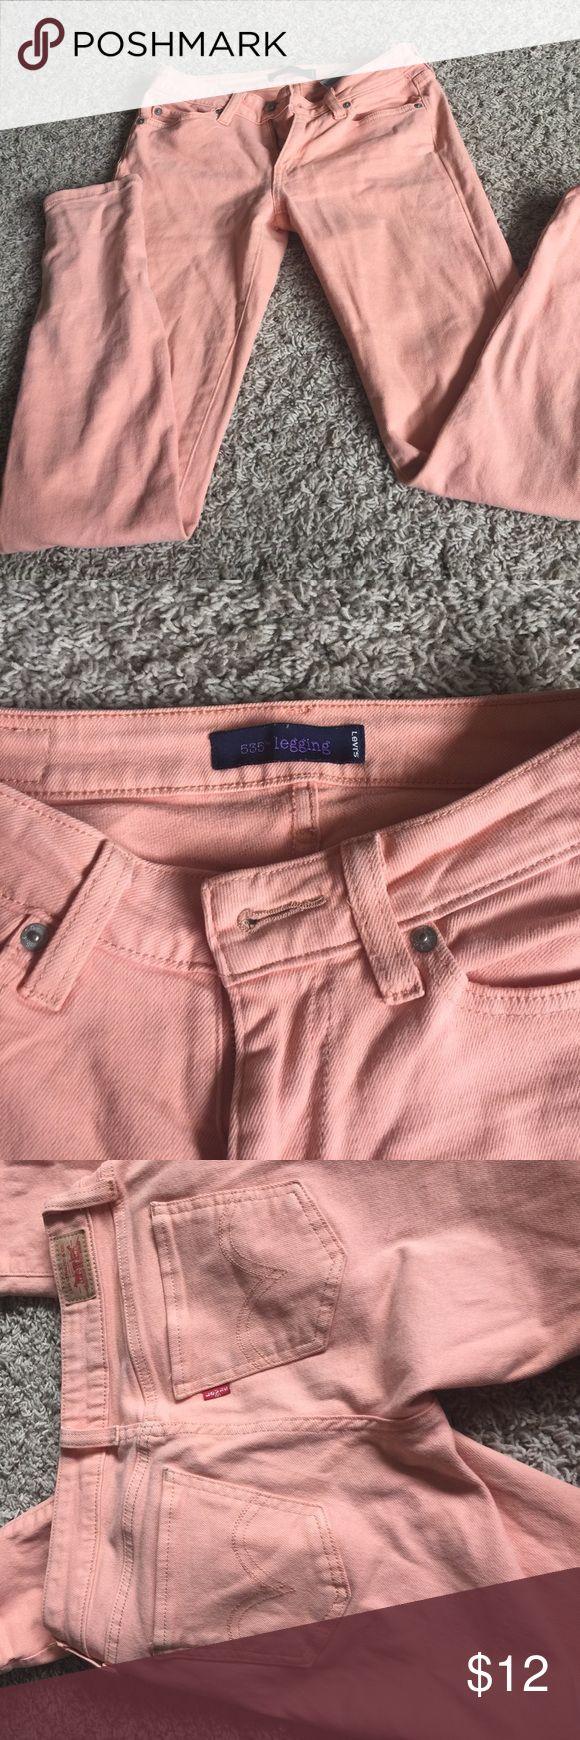 Women's coral skinny jeans Women's Levi 535 coral legging Levi's Jeans Skinny